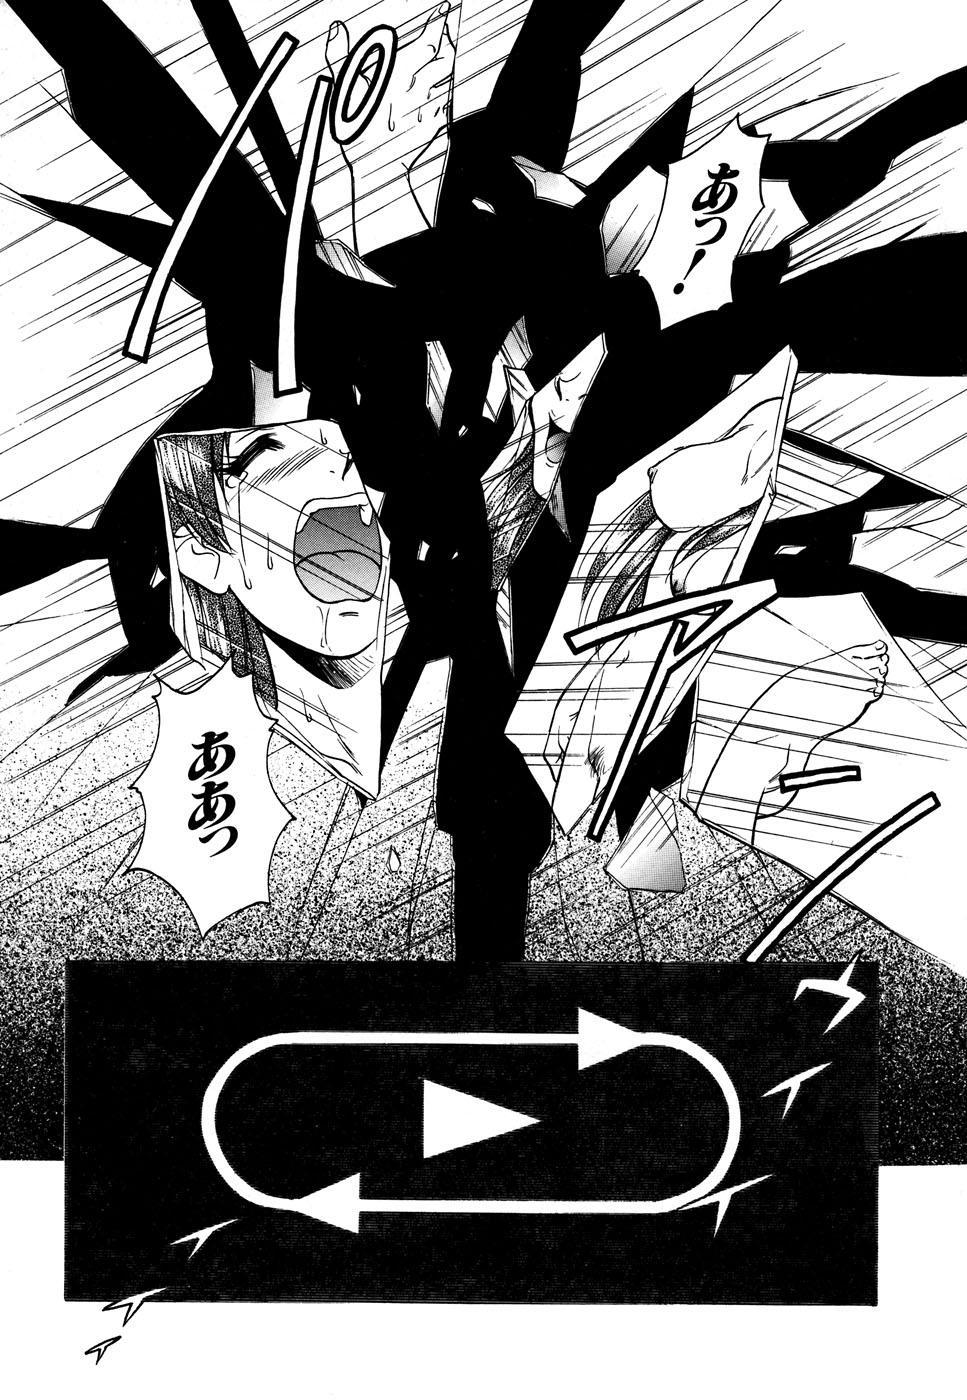 G-drive Vol.1 Ryoujokuhen 160